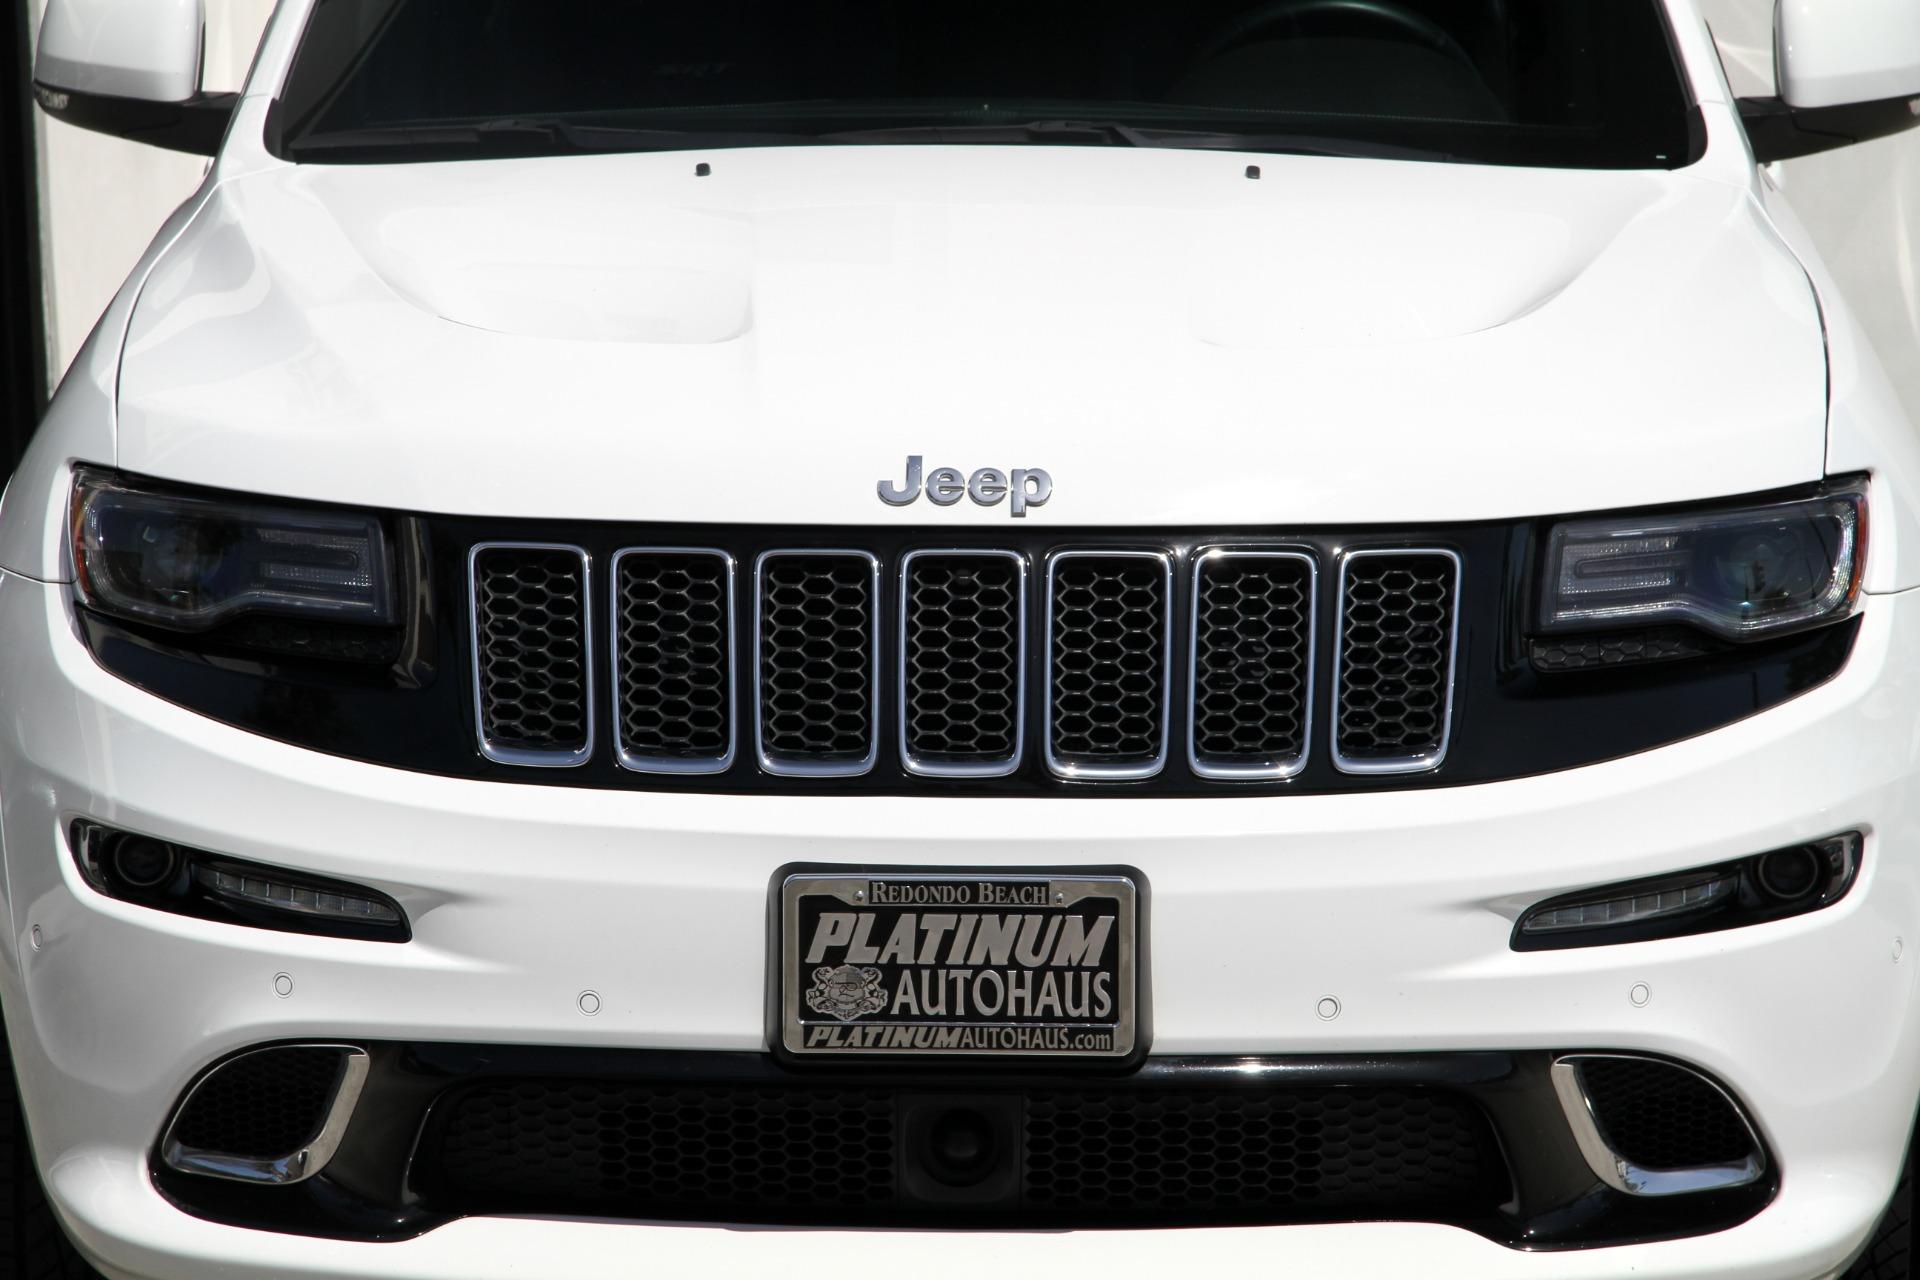 2014 jeep grand cherokee srt stock 6147a for sale near redondo beach ca ca jeep dealer. Black Bedroom Furniture Sets. Home Design Ideas